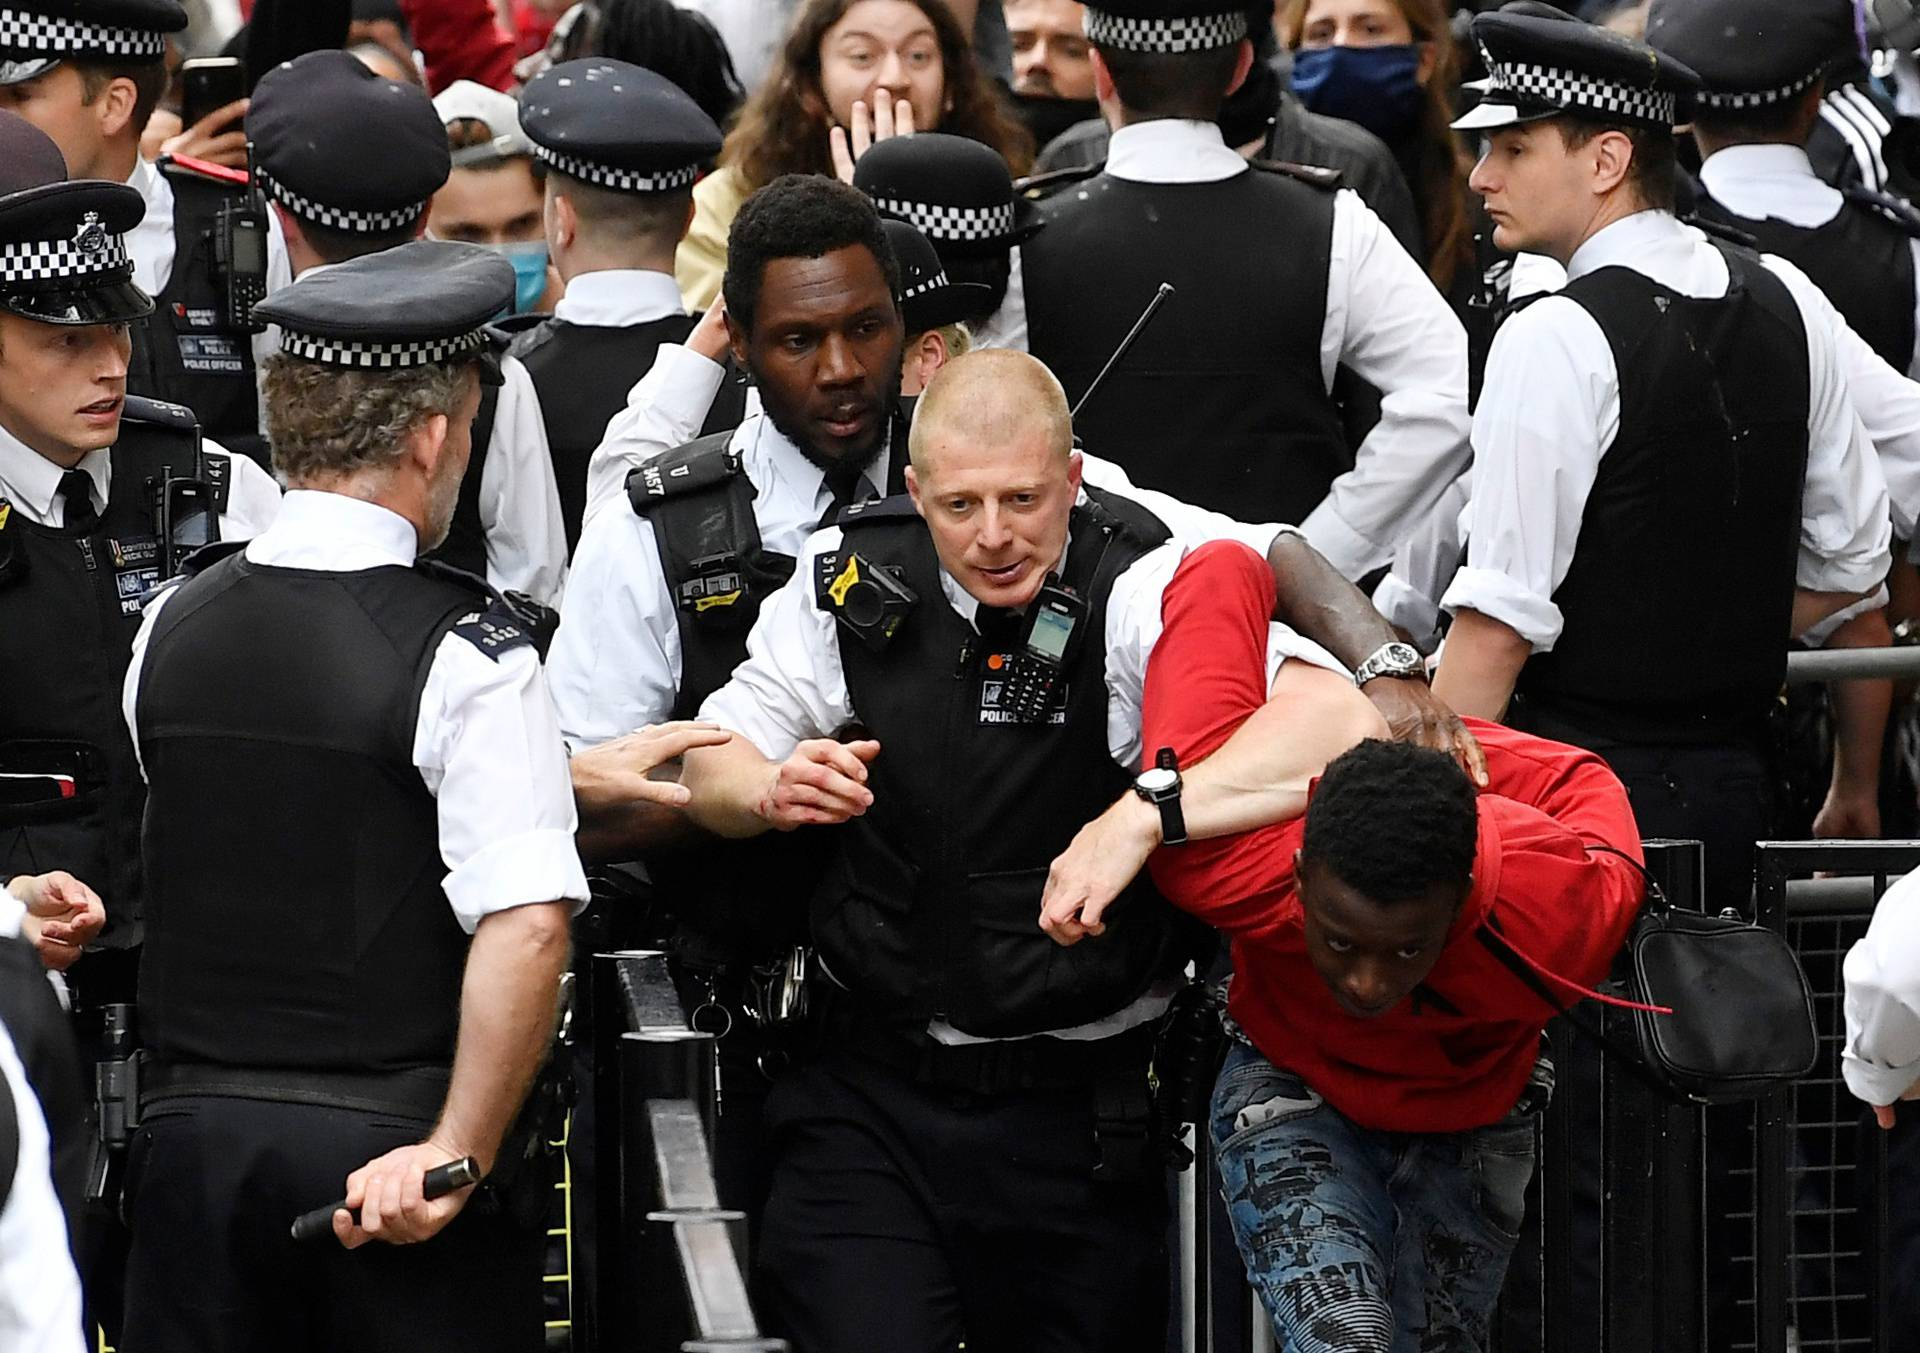 London: 'Nema pravde, nema mira, bez rasističke policije'